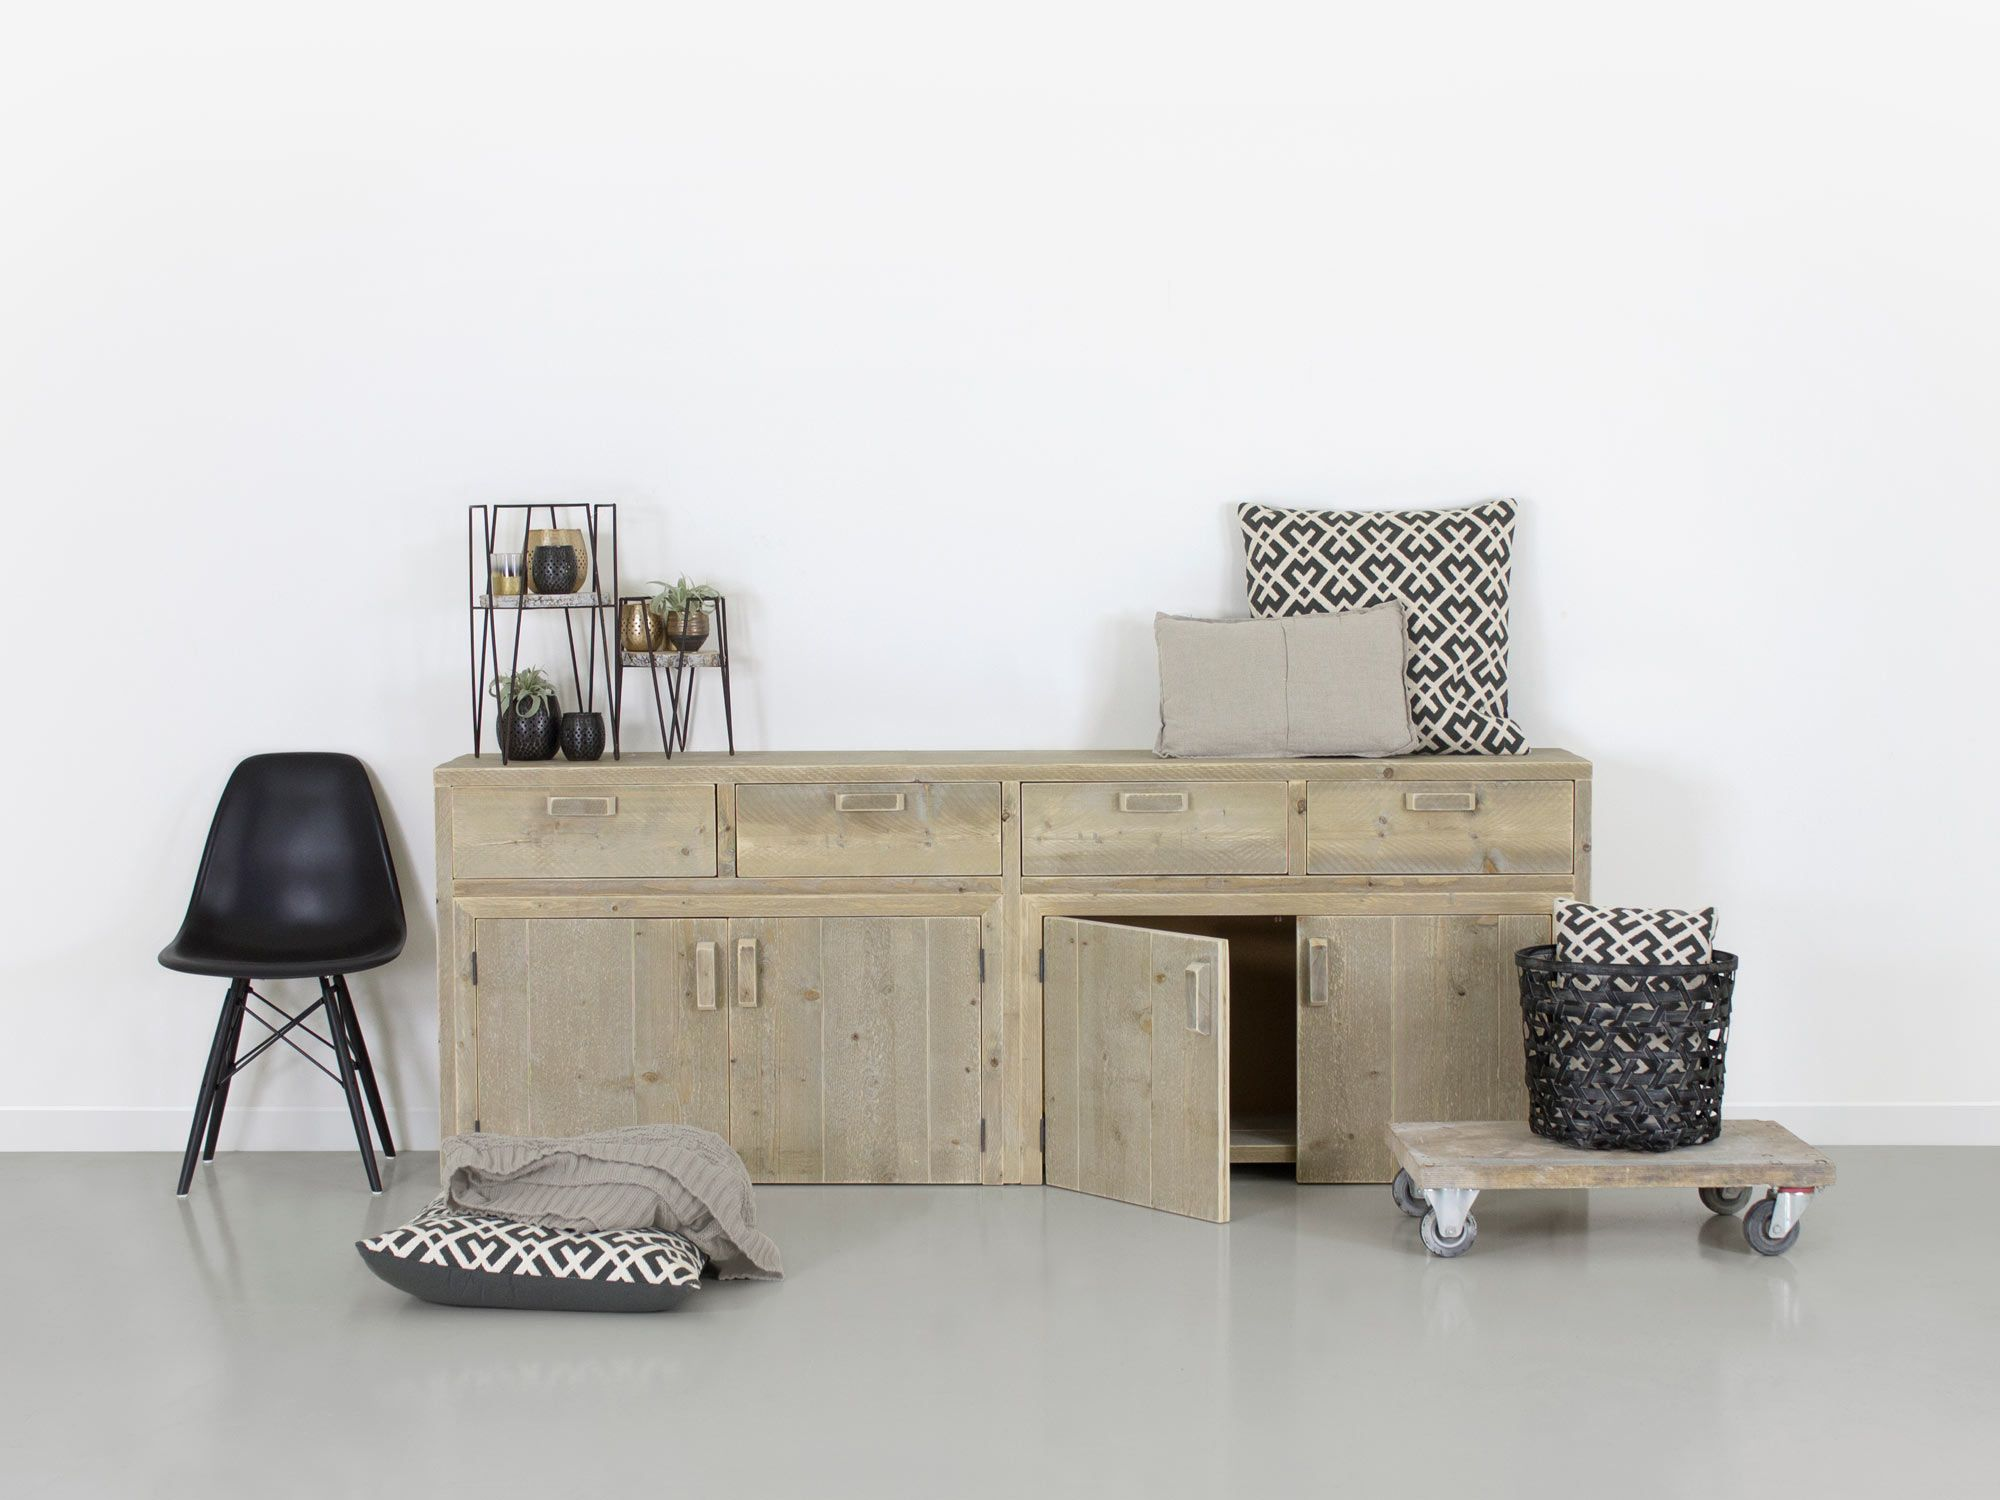 Kommode design büro  Bauholz Kommode Alma - Bauholz Möbel & Dutch Design Bauholz Design ...